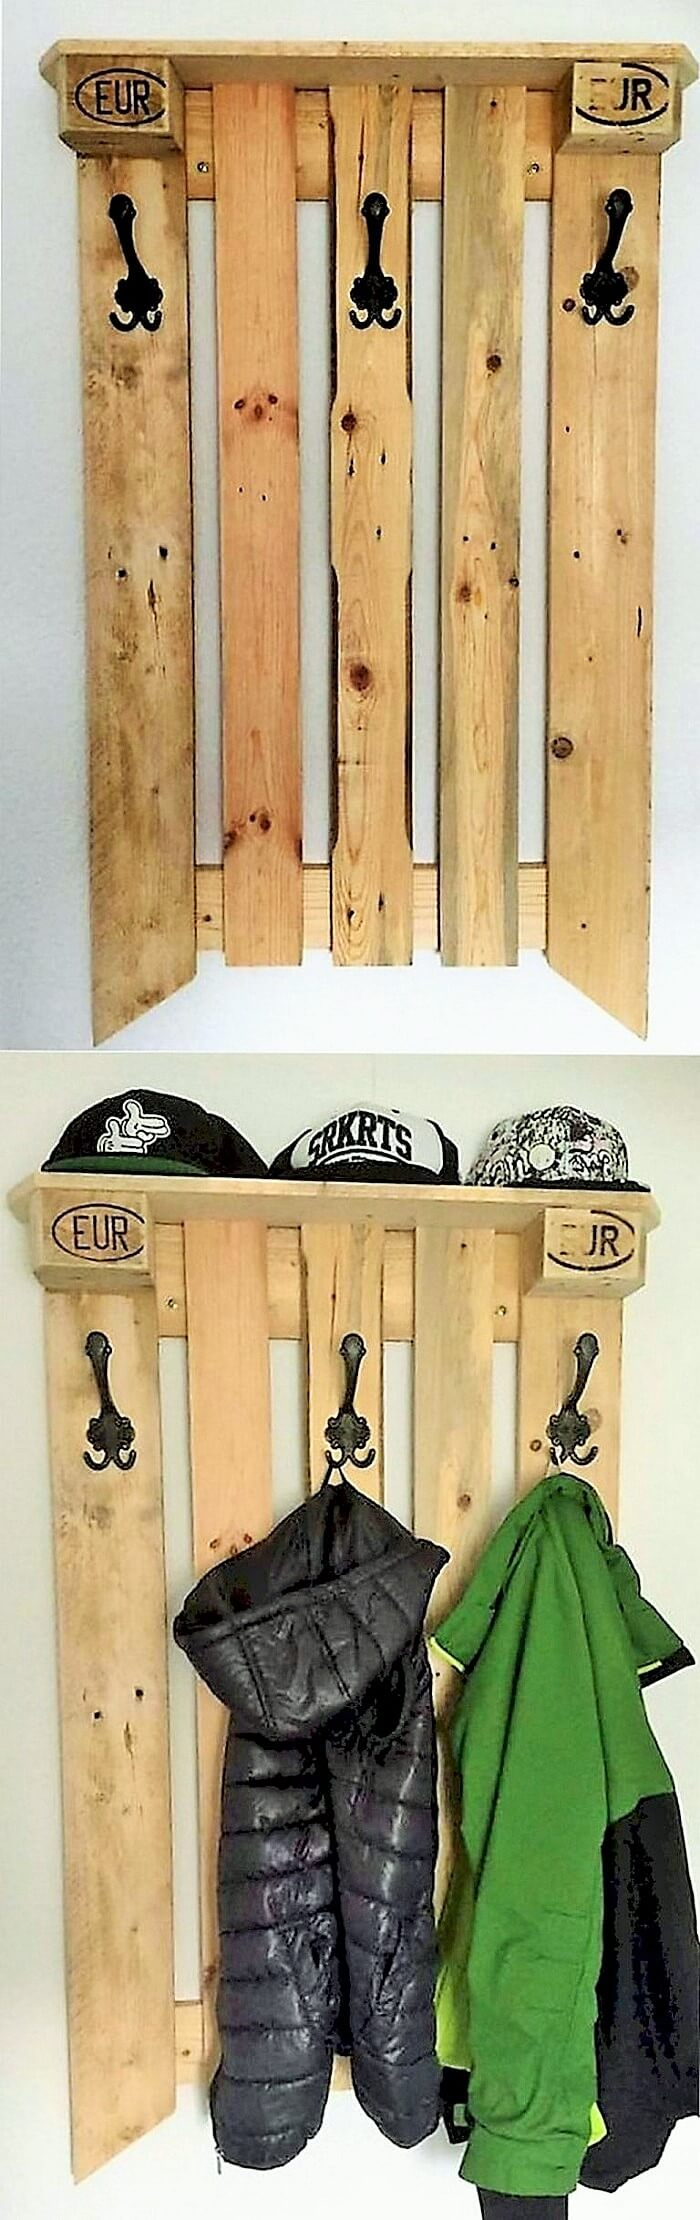 DIY-Wodden-Pallet-Furniture-Projects (2)